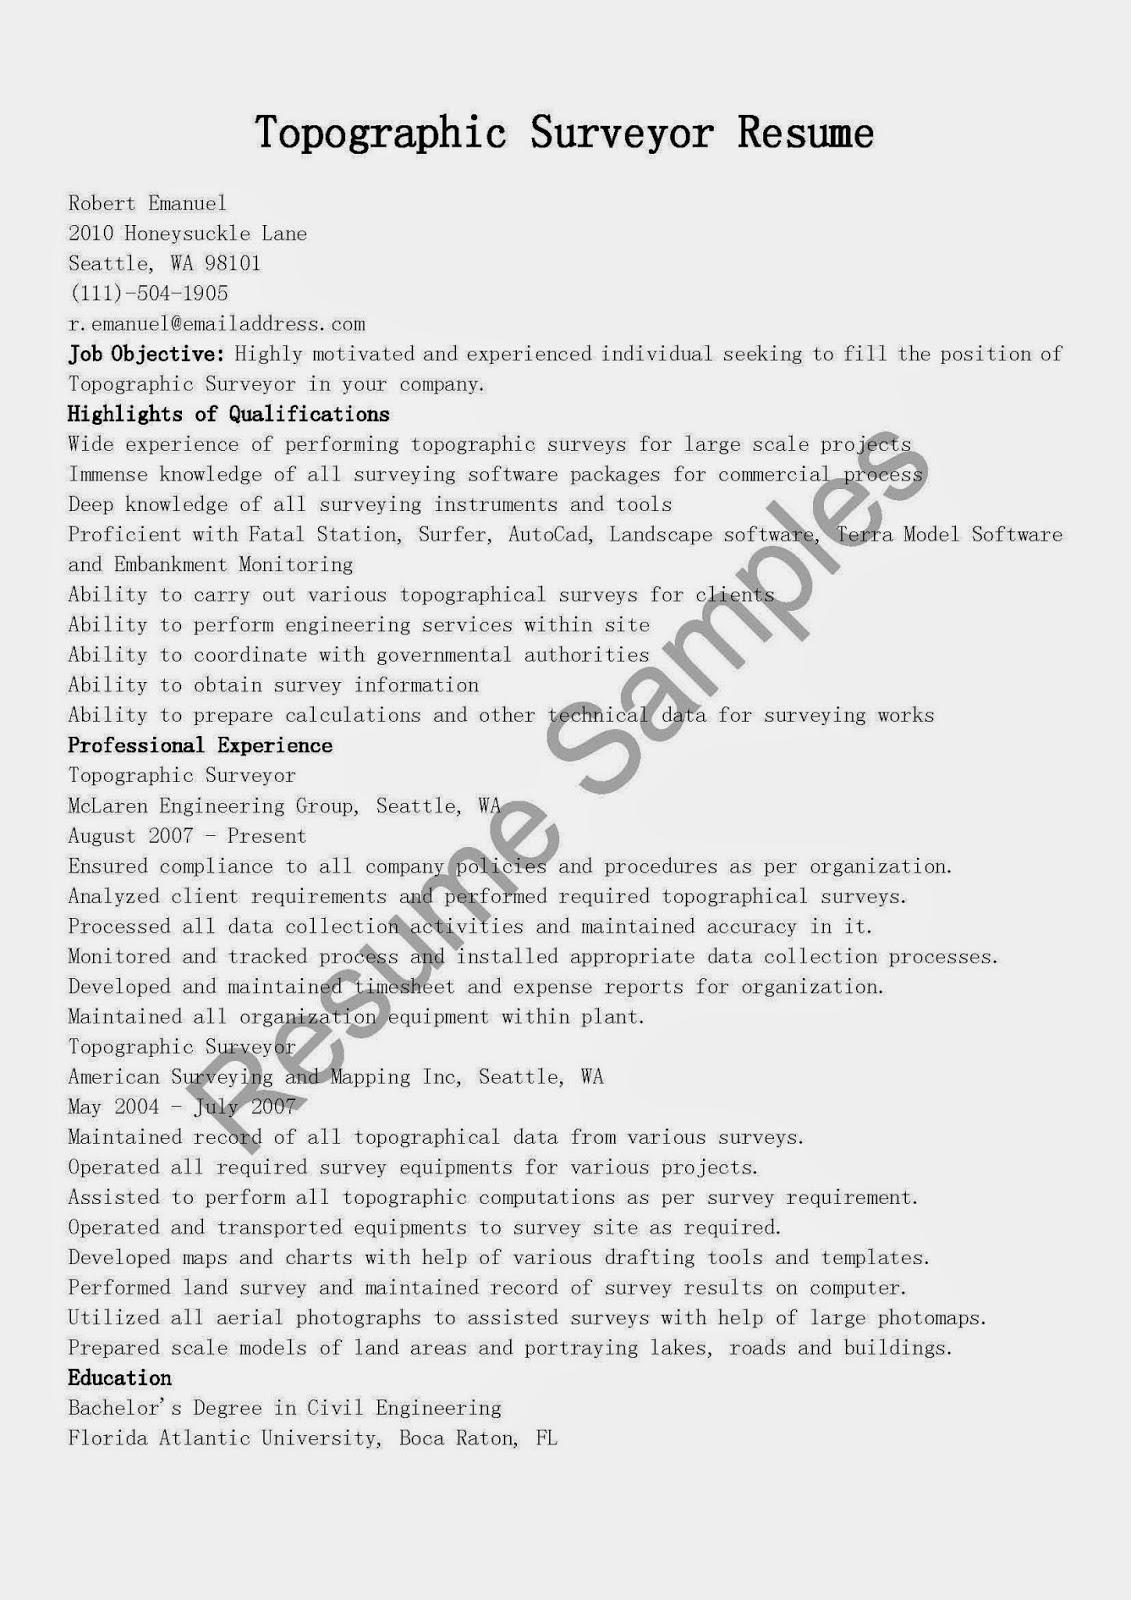 resume samples  building surveyor resume sample